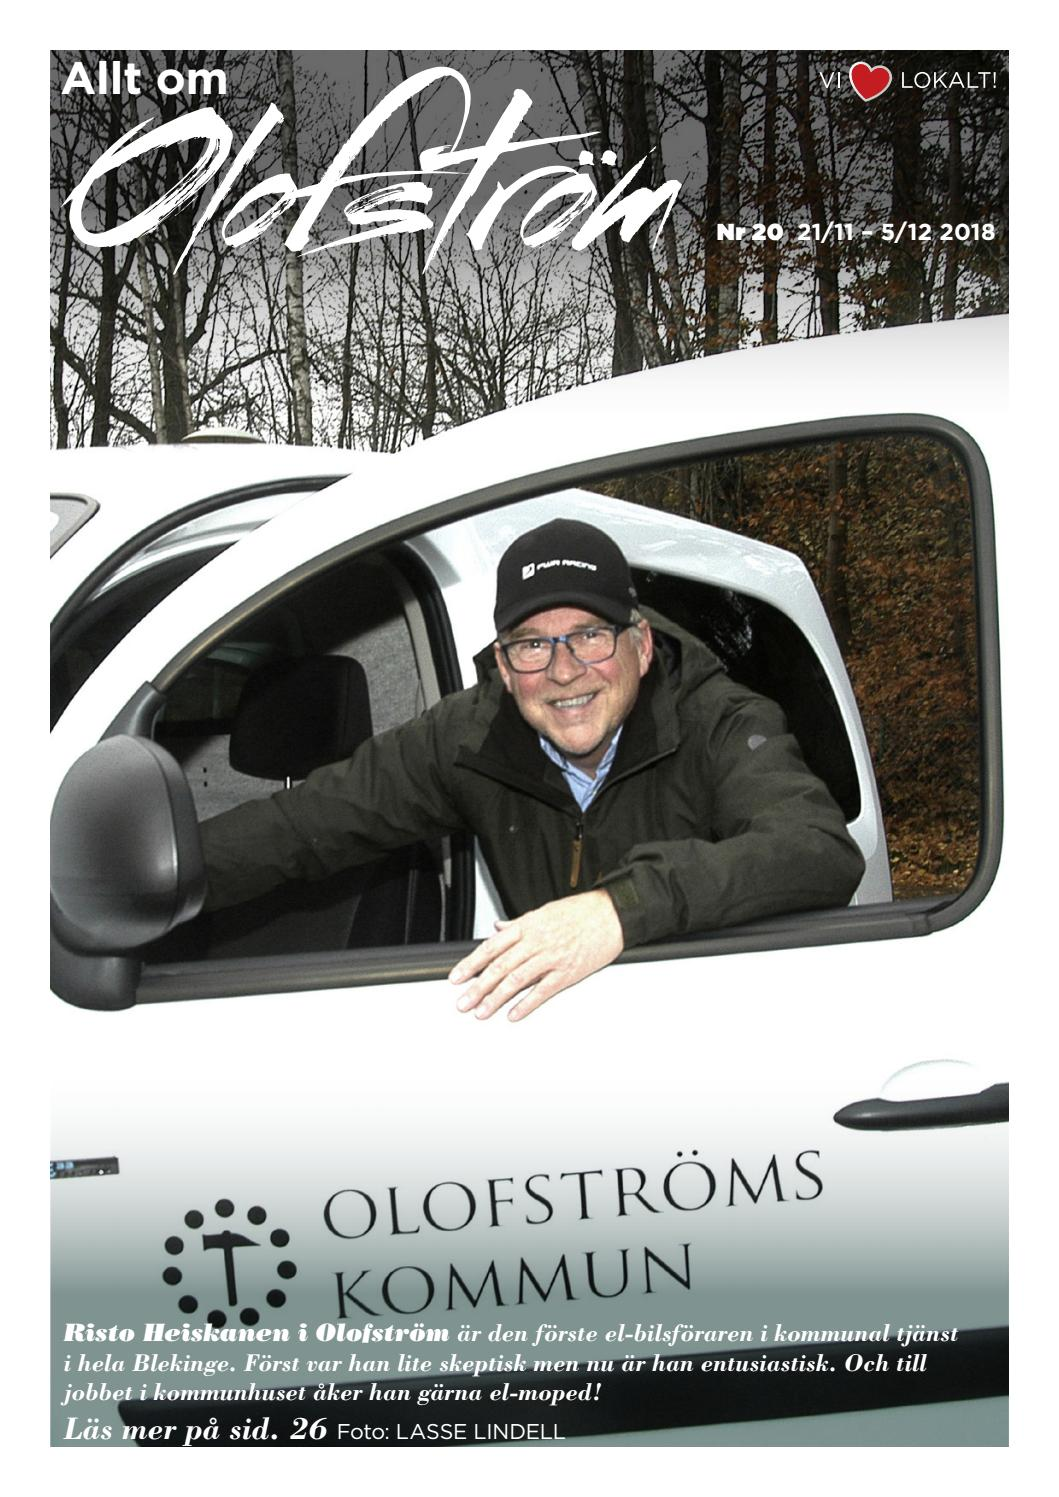 Allt om Olofström nr. 20 2018 by Espresso reklambyrå - issuu 4076e8b83d452